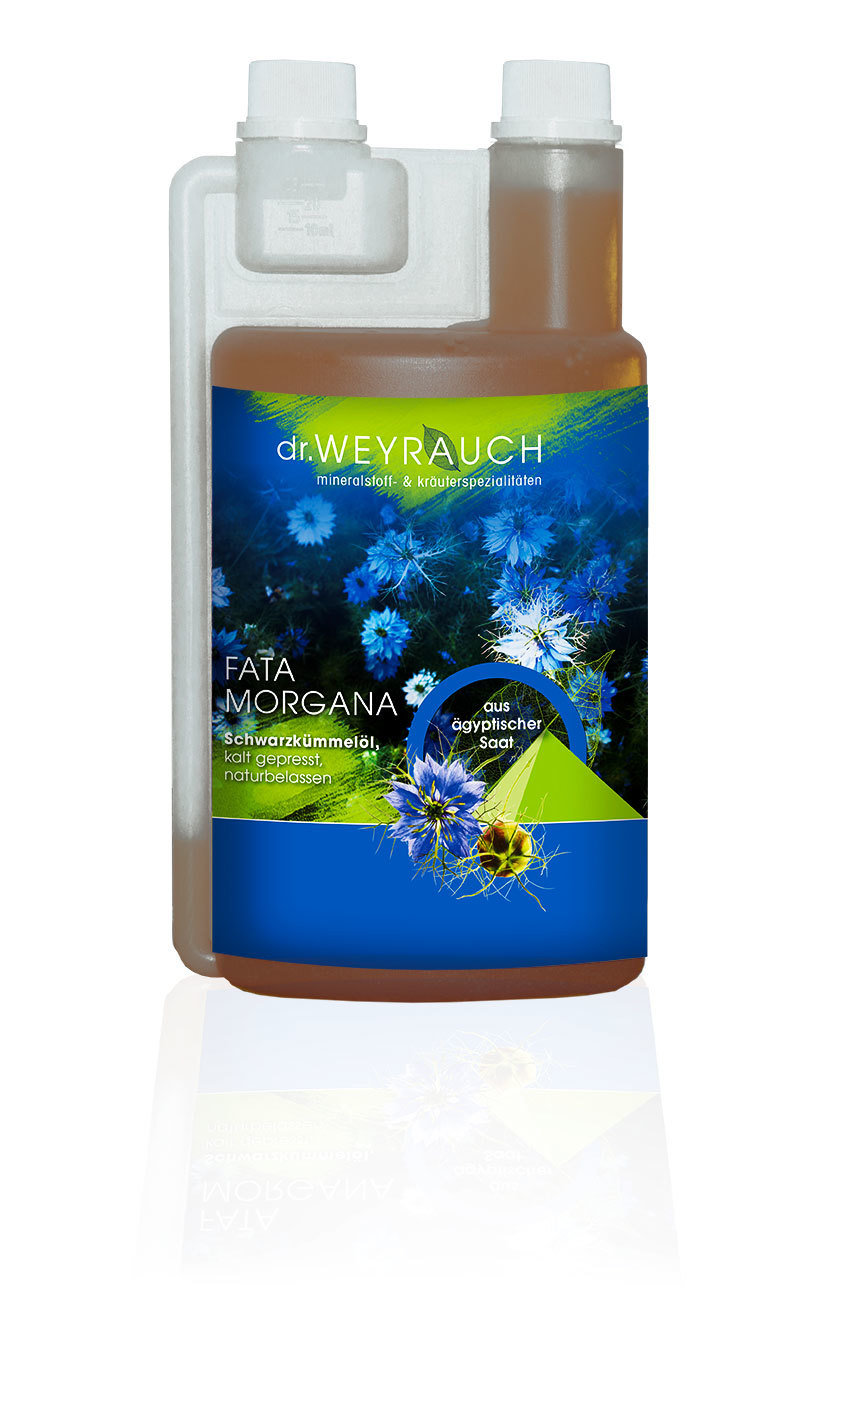 Dr.Weyrauch Fatamorgana Schwarzkümmelöl